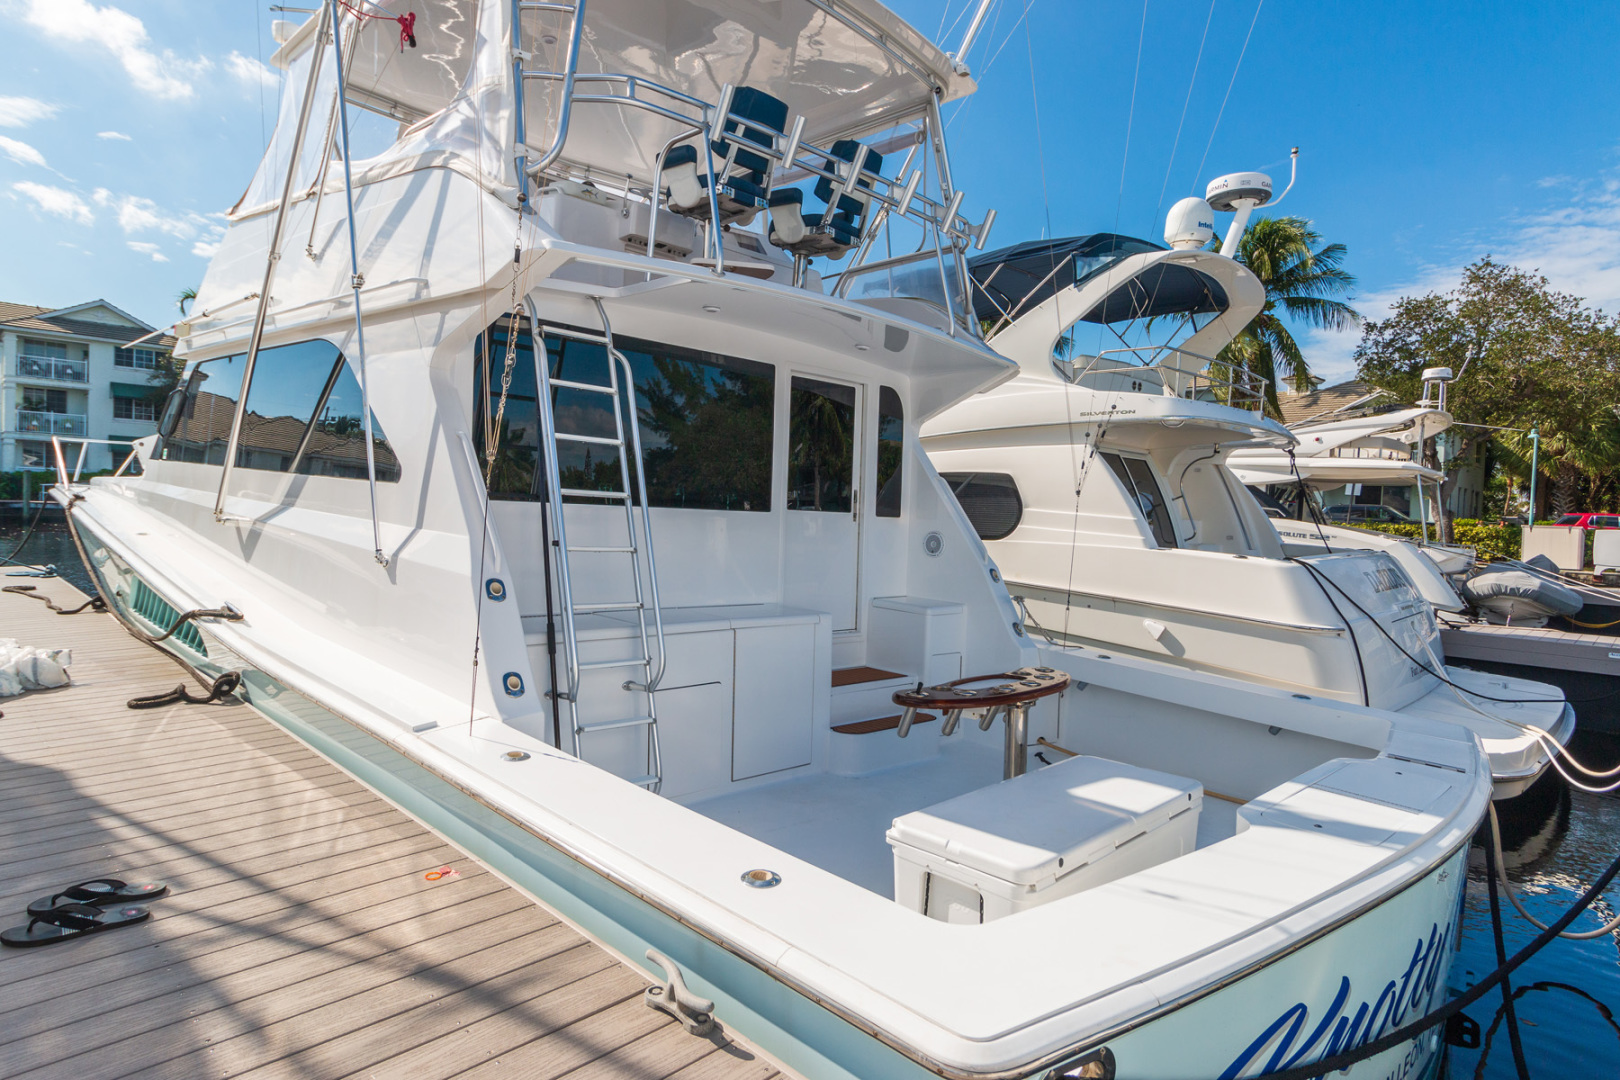 Viking-Convertible 2000-Knotty Girl Fort Lauderdale-Florida-United States-1564771   Thumbnail